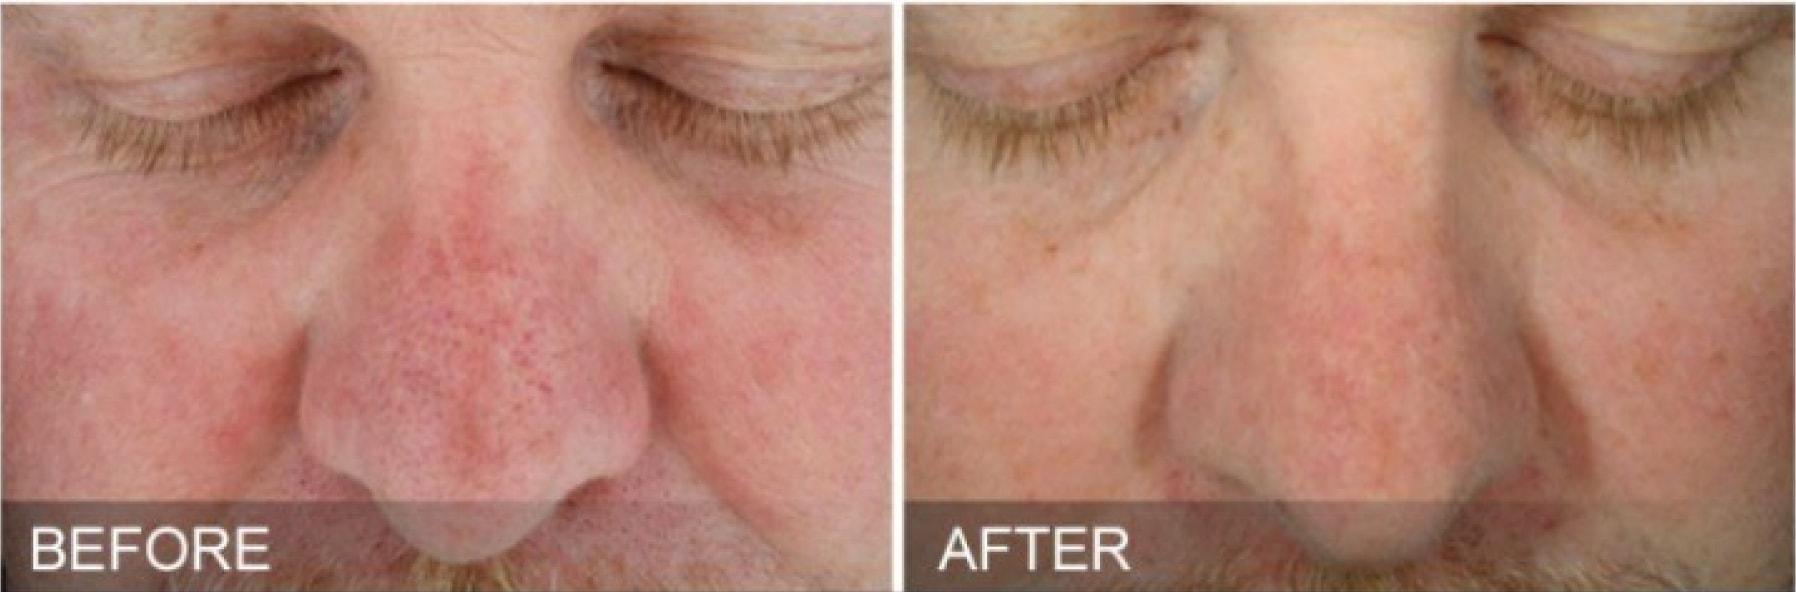 HydraFacial pore results